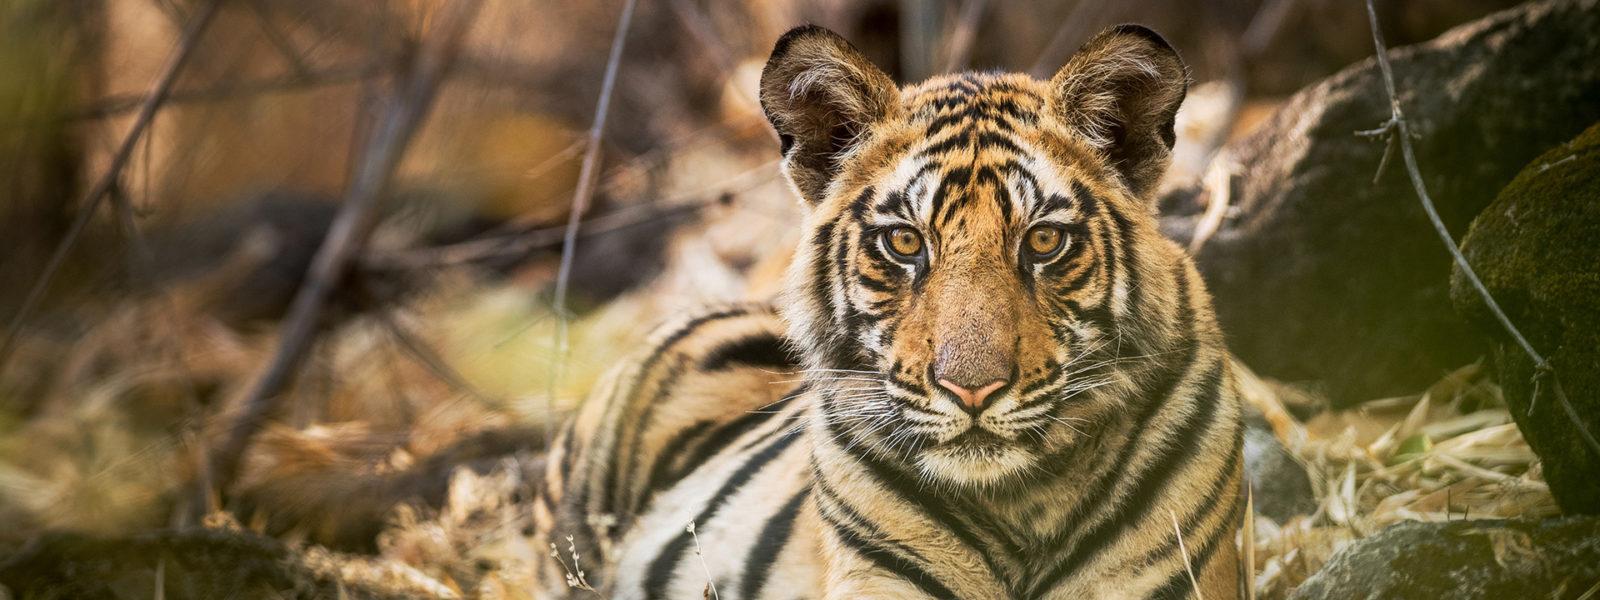 Tiger_1920x1080